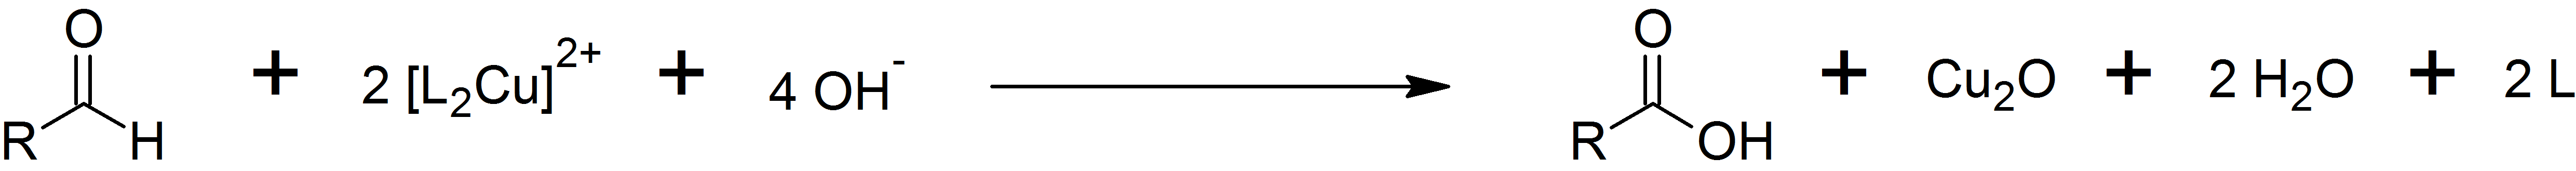 Тест Фиглю